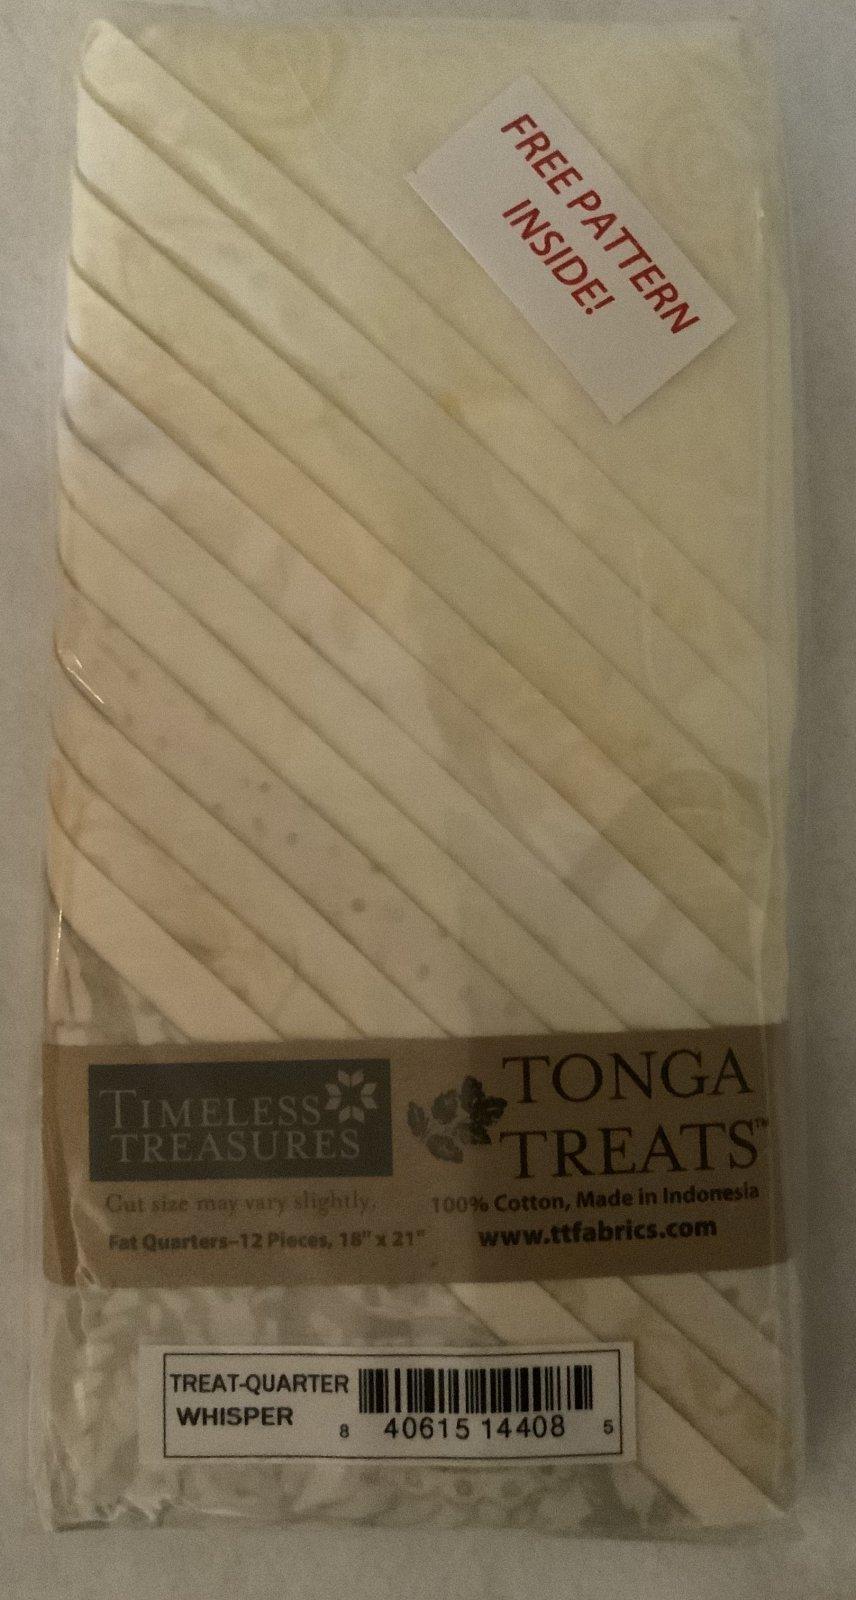 Tonga Treat Fat Quarters Whisper (18in x 21in) 12pcs - Timeless Treasures